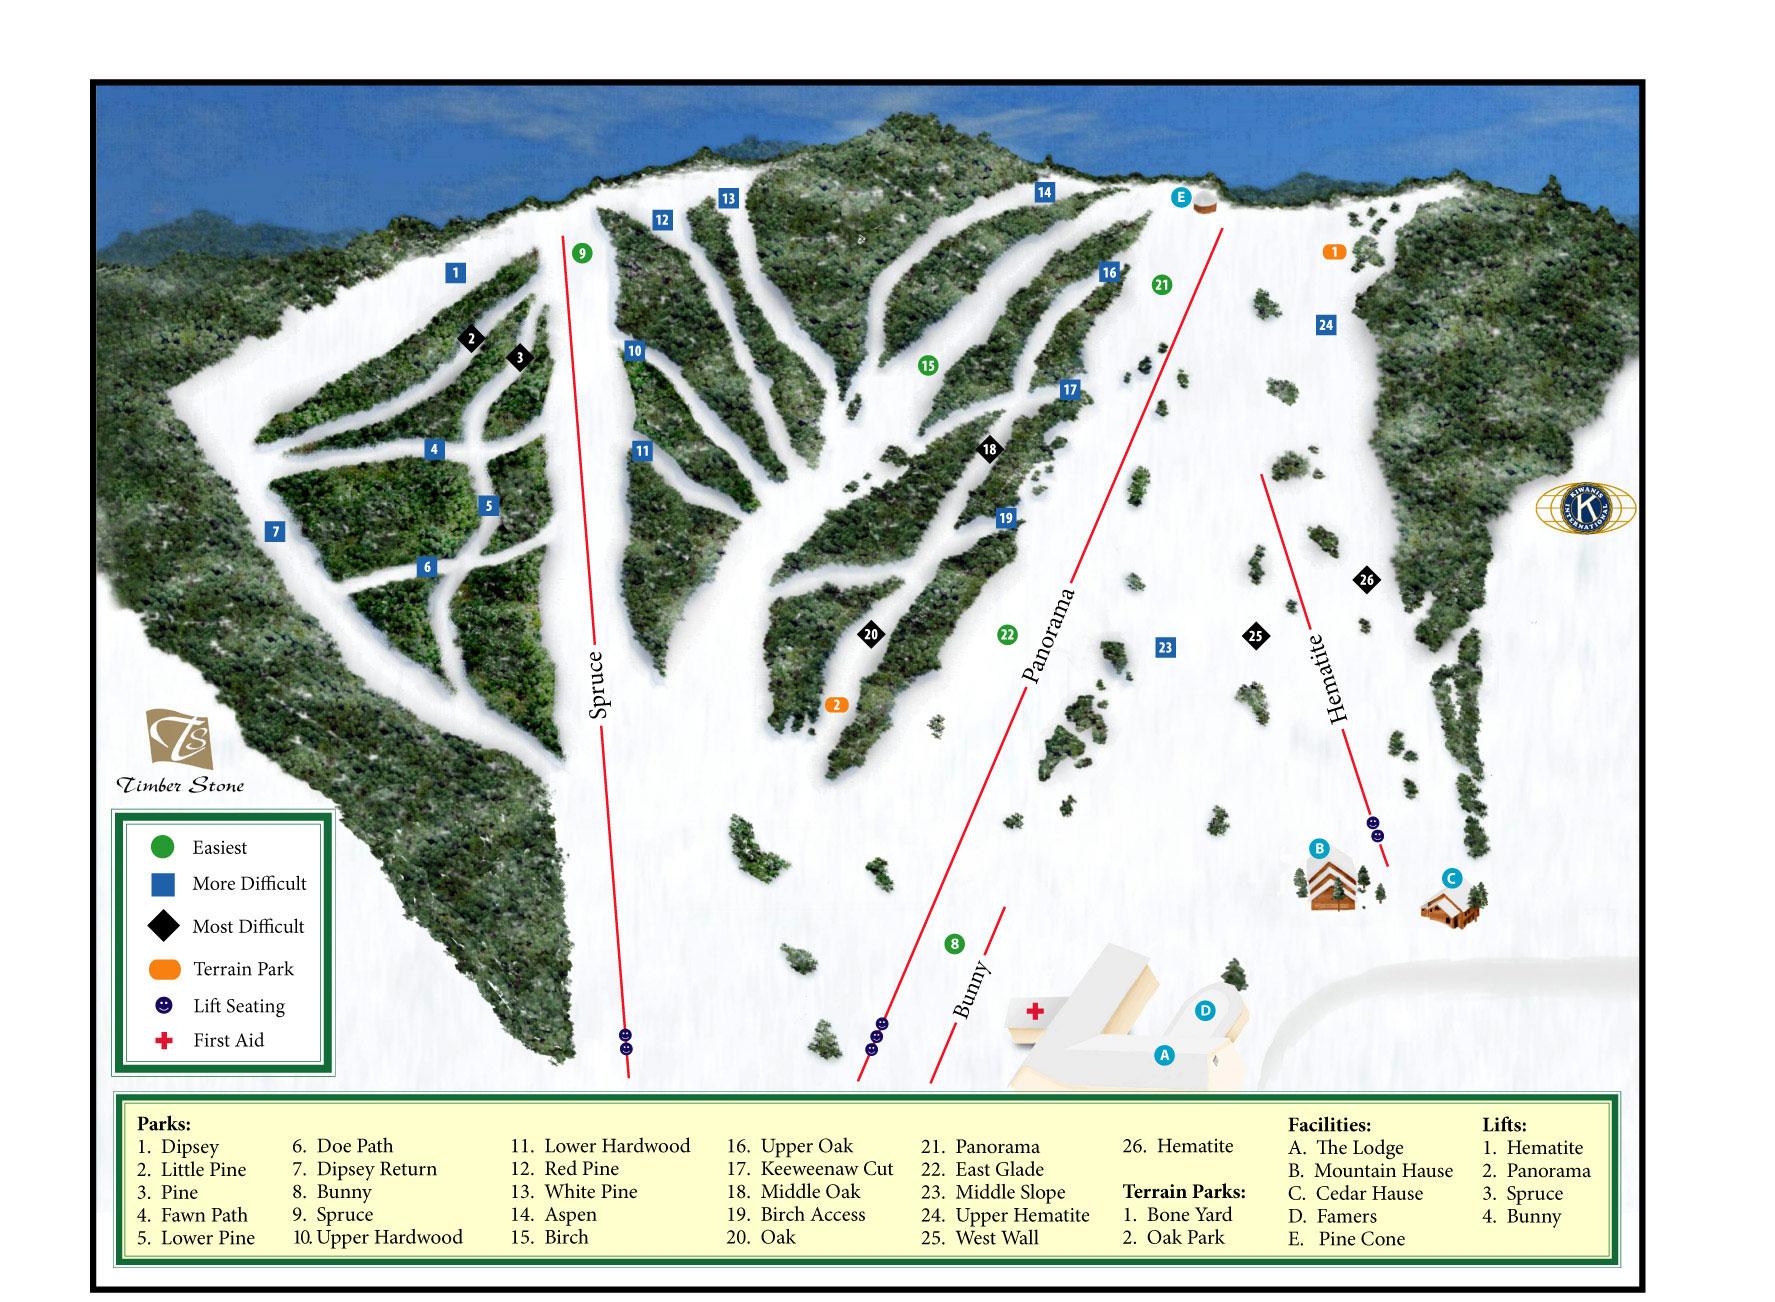 Skiing In Michigan Map.Pine Mountain Resort Ski Trail Map Iron Mountain Michigan United